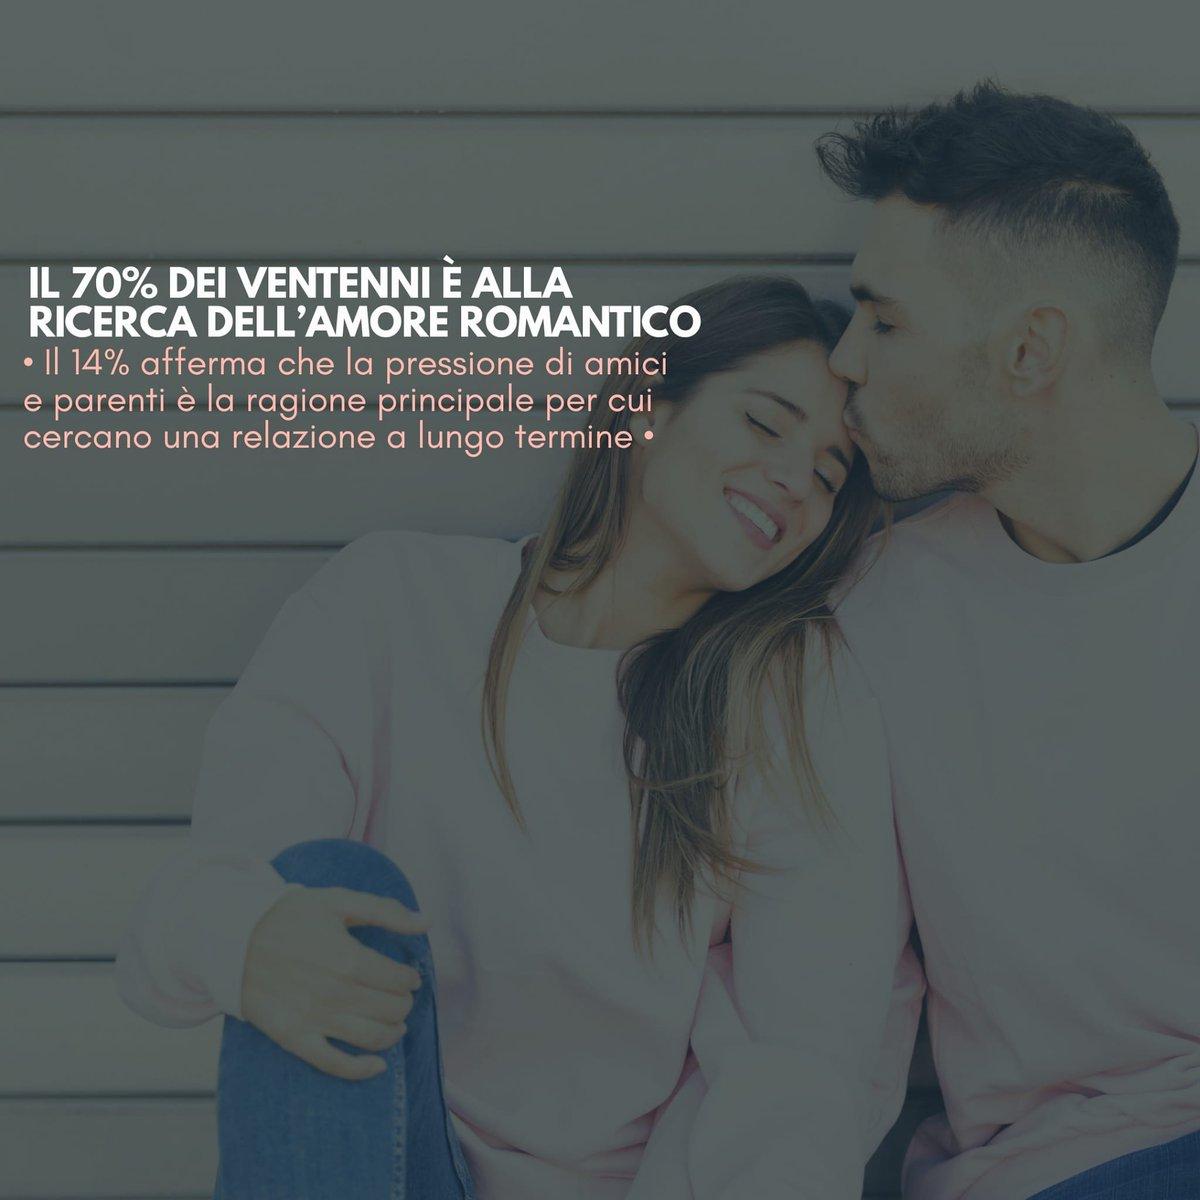 Il 70% dei ventenni è alla ricerca dell'amore romantico.  (Indagine Match Group 2019)   #gd_app #GDbeta #startup #startupitalia  https://www.instagram.com/p/B8yrvtZILK2/?igshid=bcfb9du7hyj0…pic.twitter.com/SVEXUYETAQ